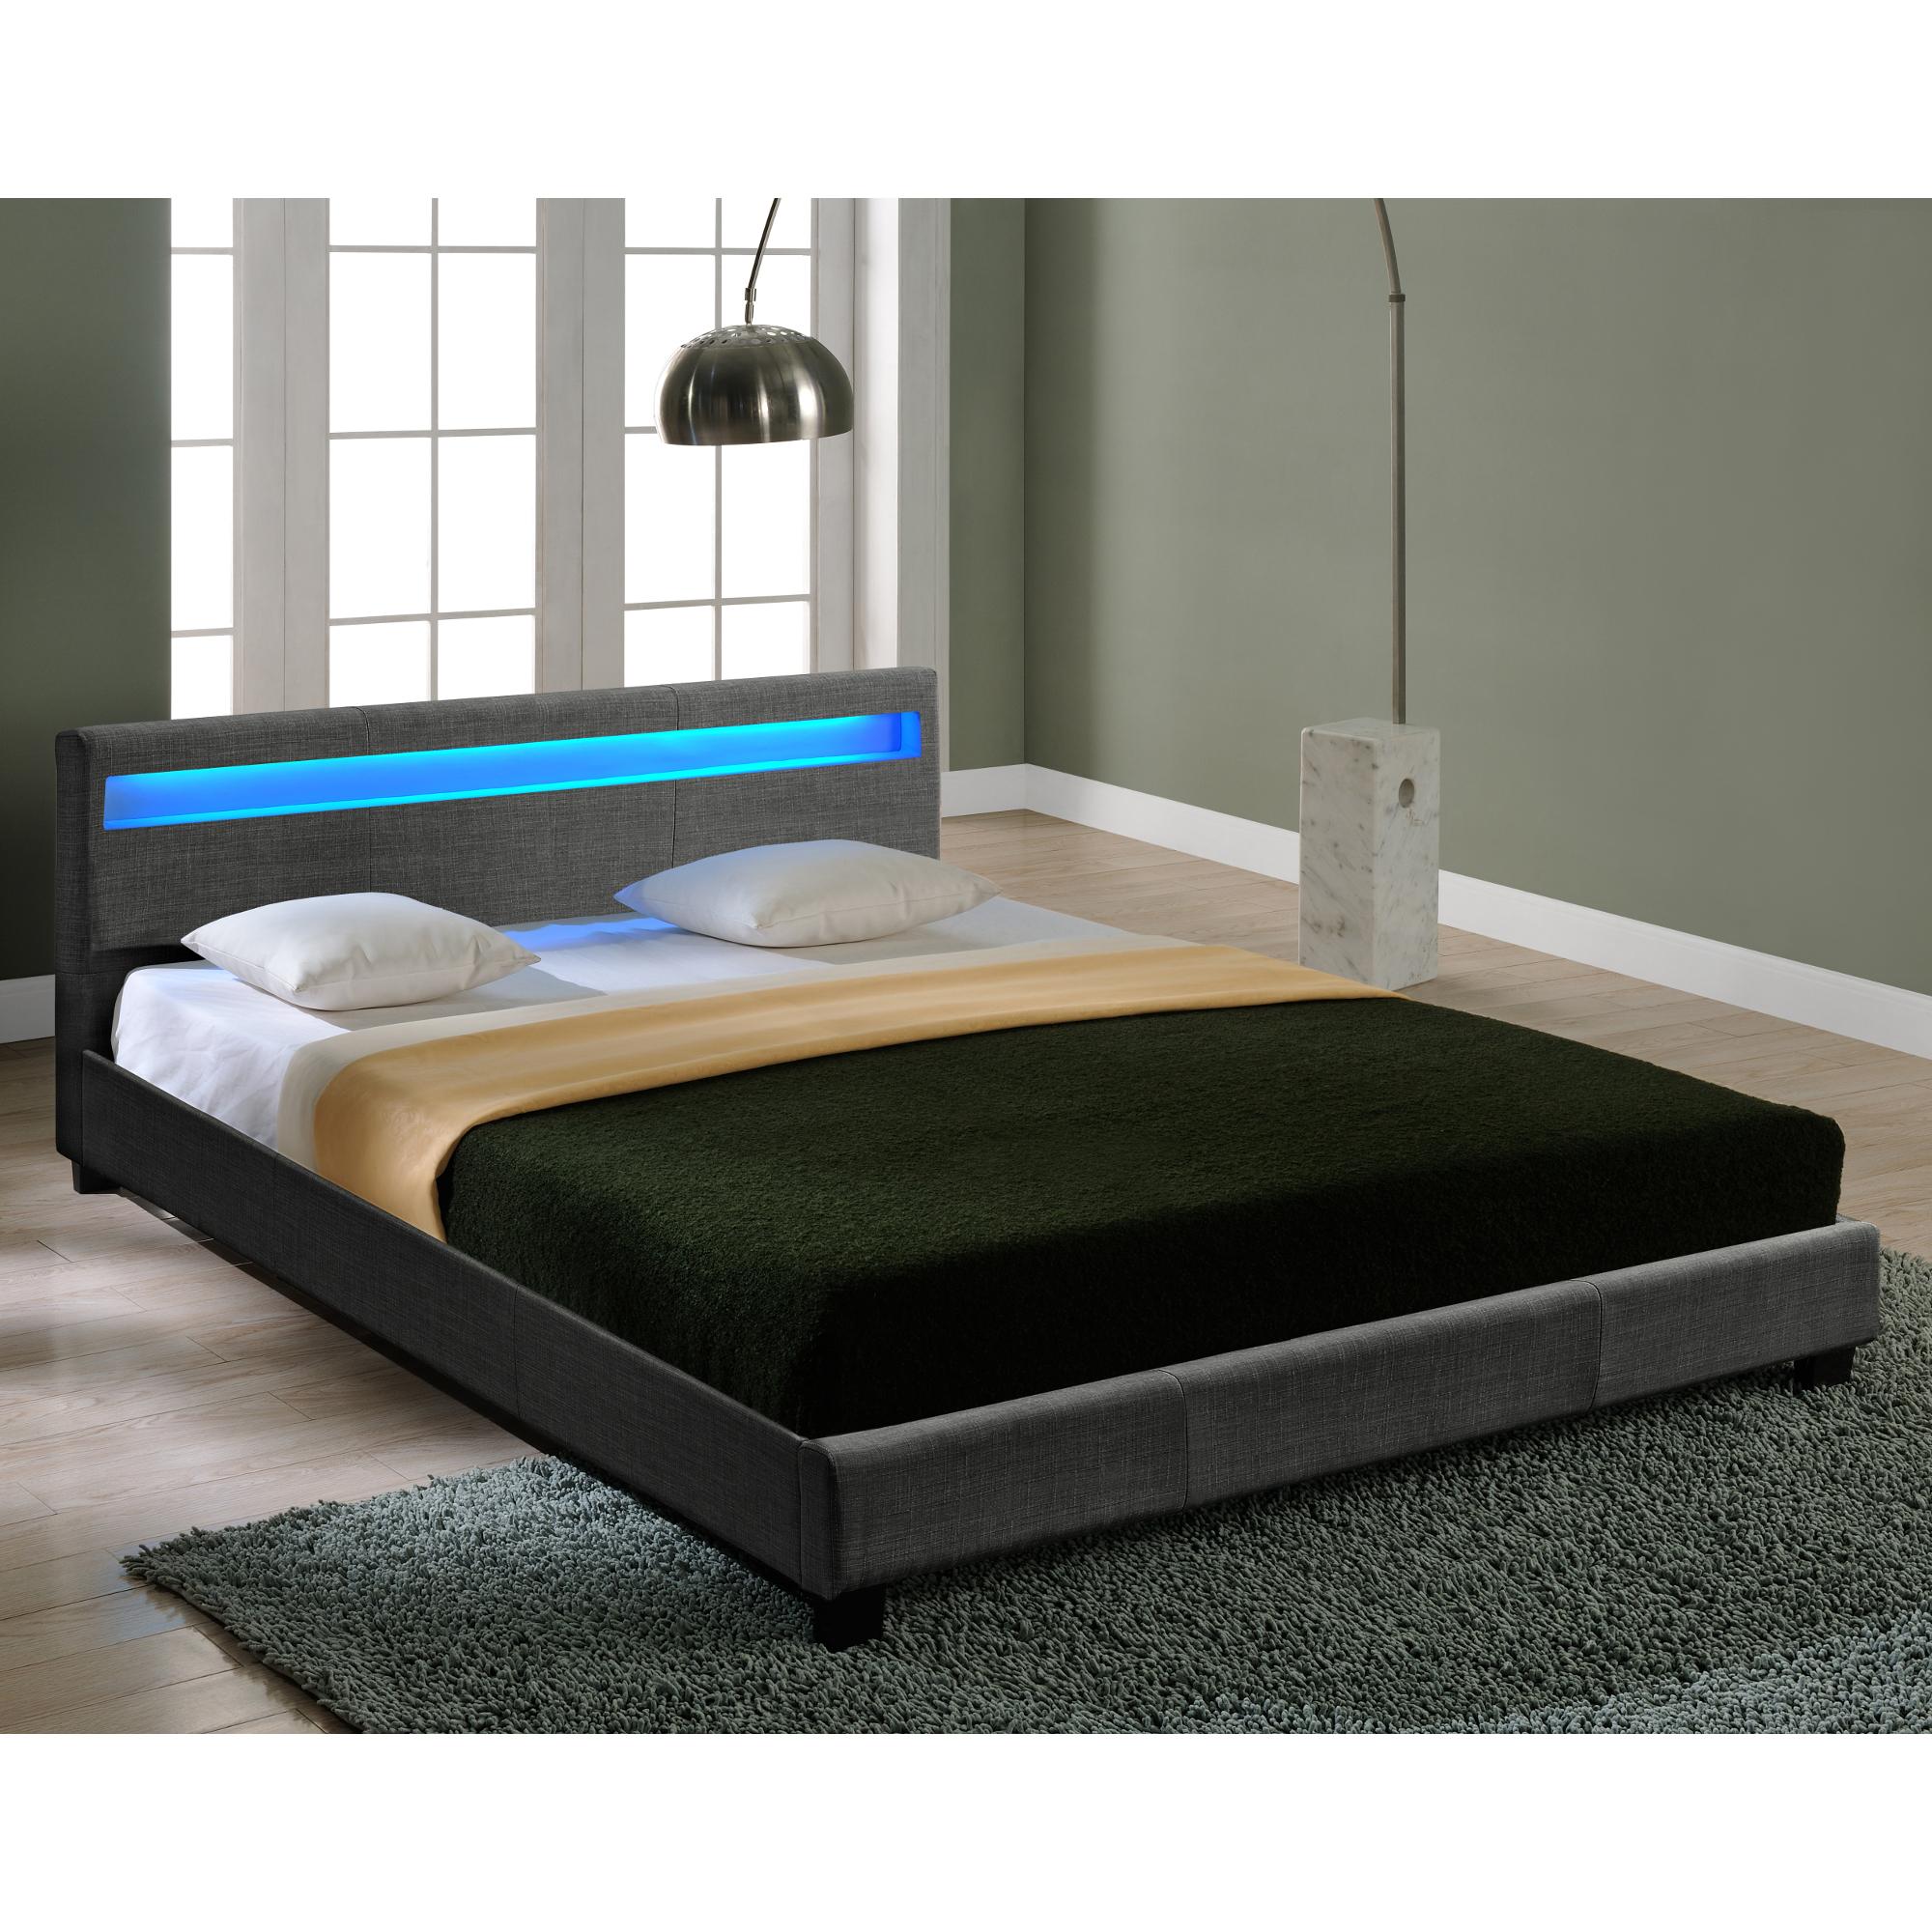 CORIUM® LED Textil Doppelbett Polsterbett 140x200cm Bettgestell Bett ...